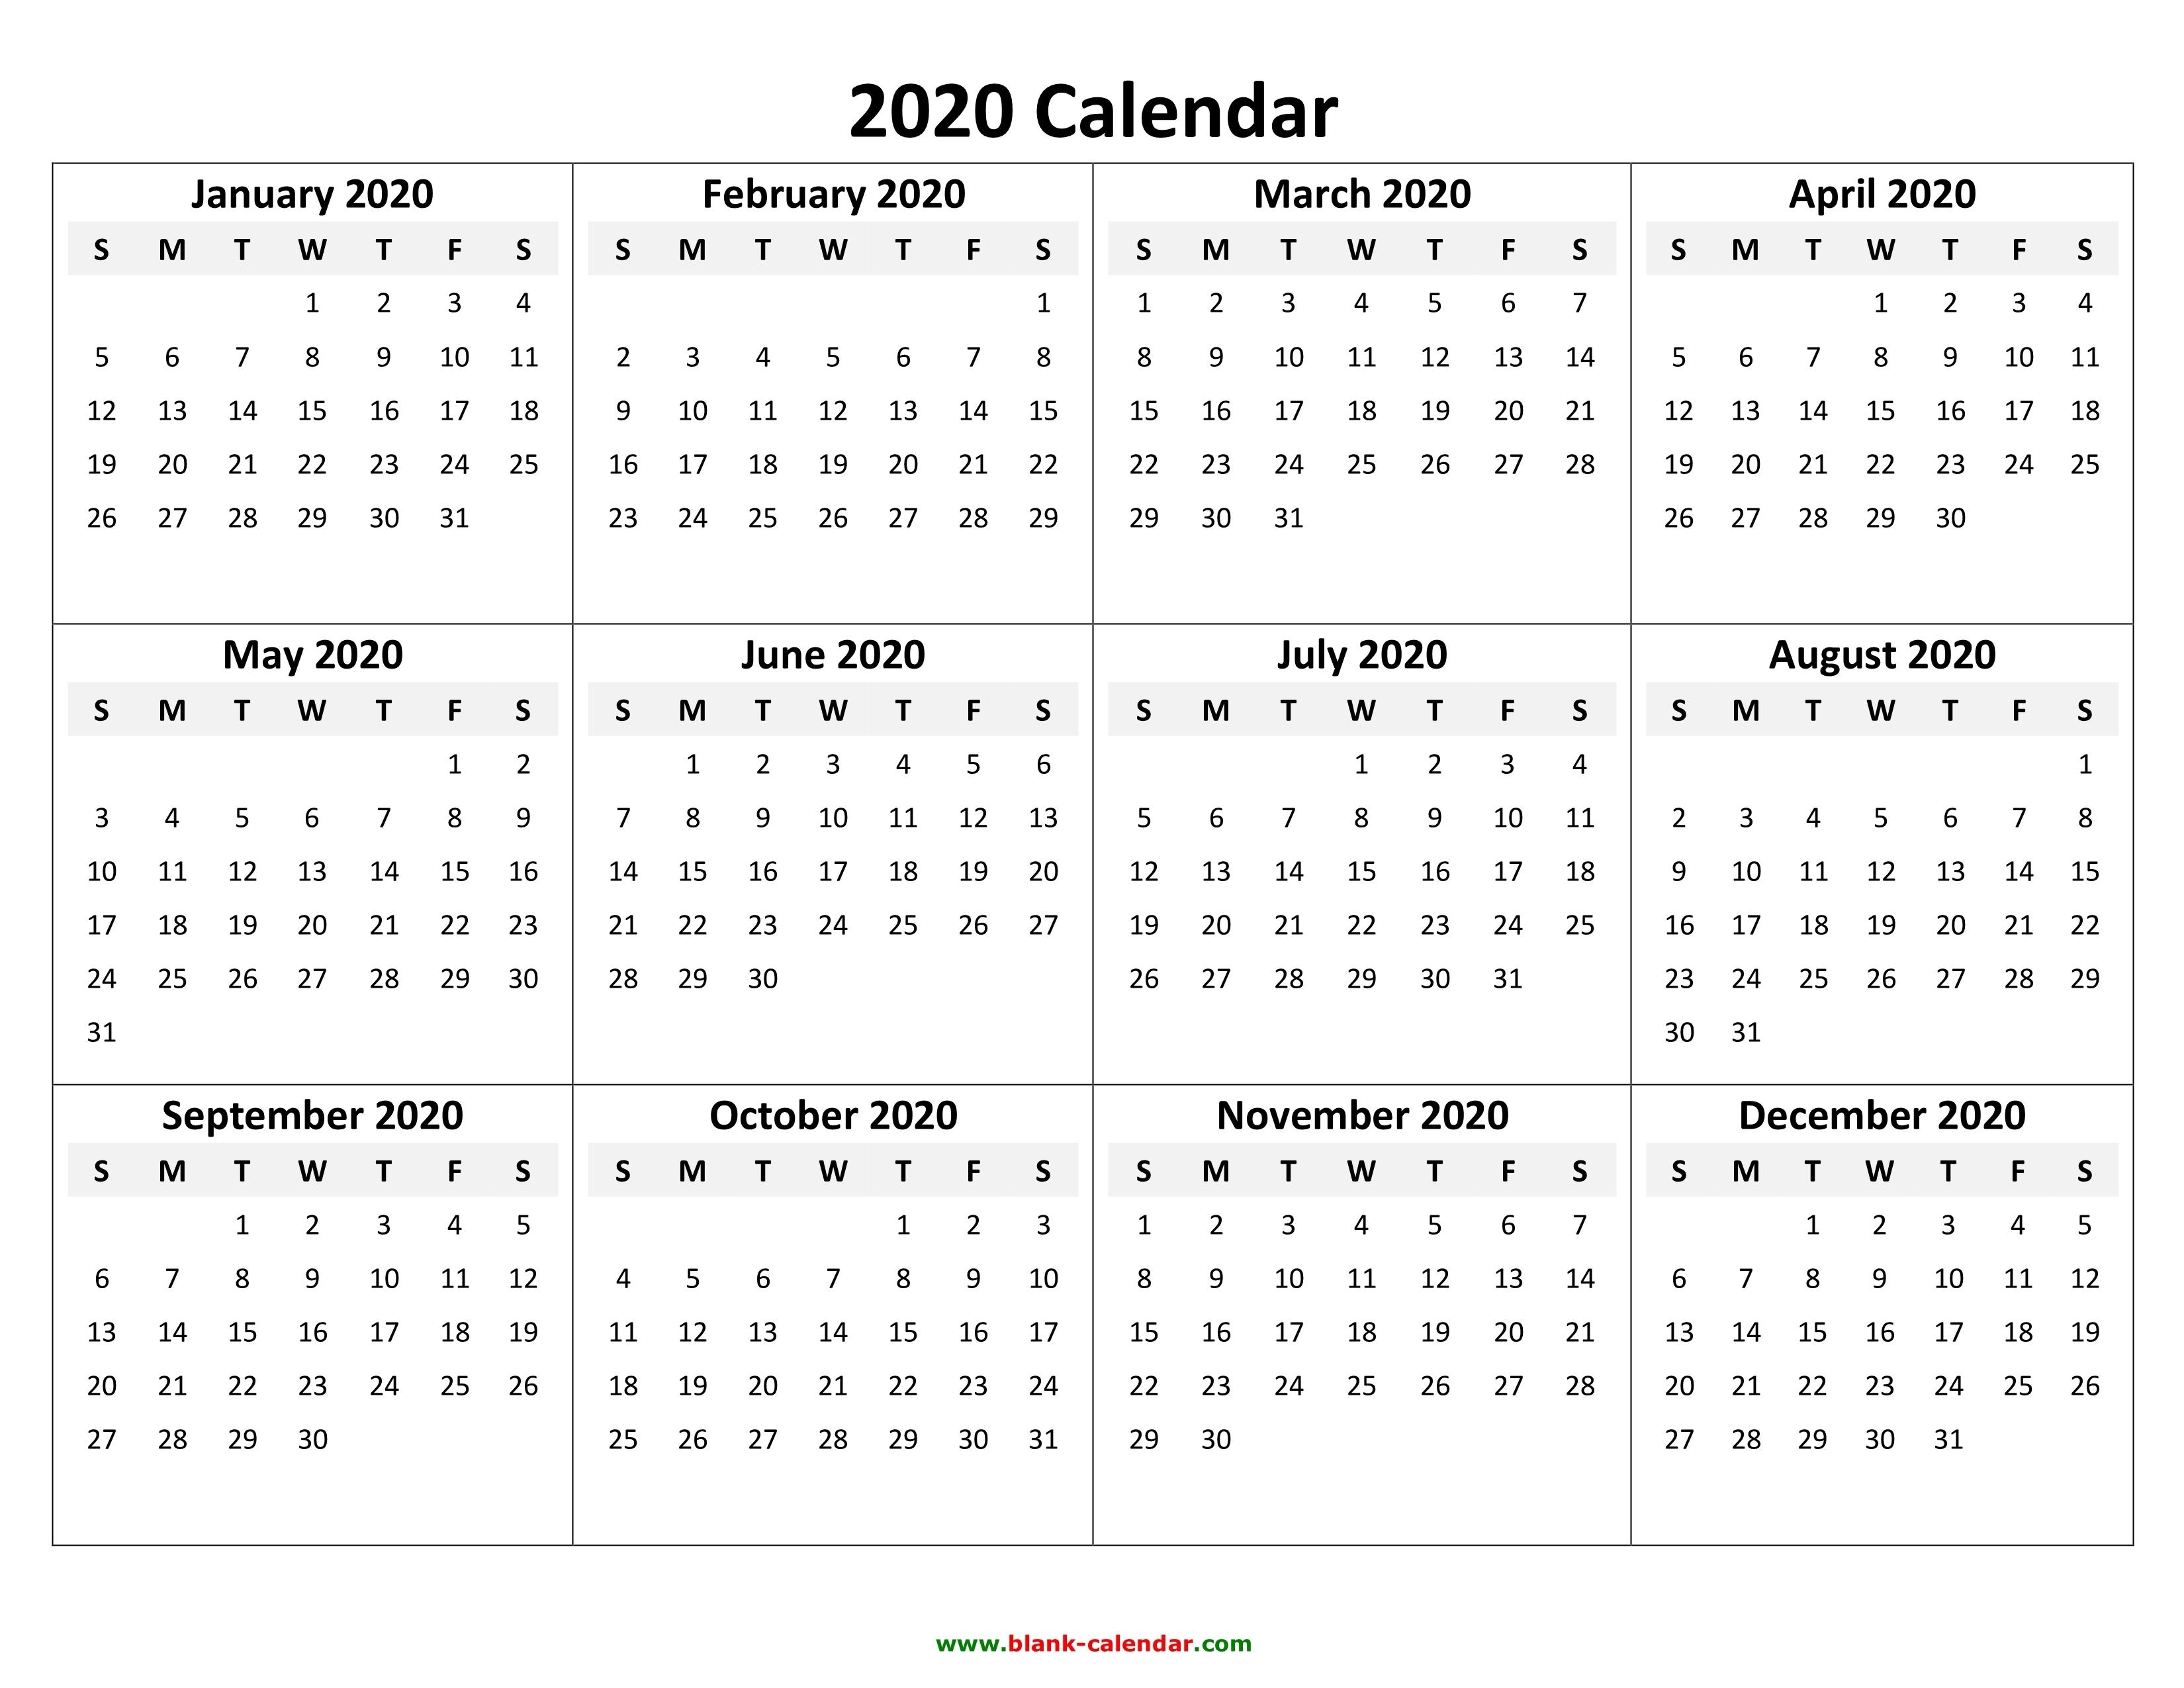 Calendar 2020 To Print - Wpa.wpart.co